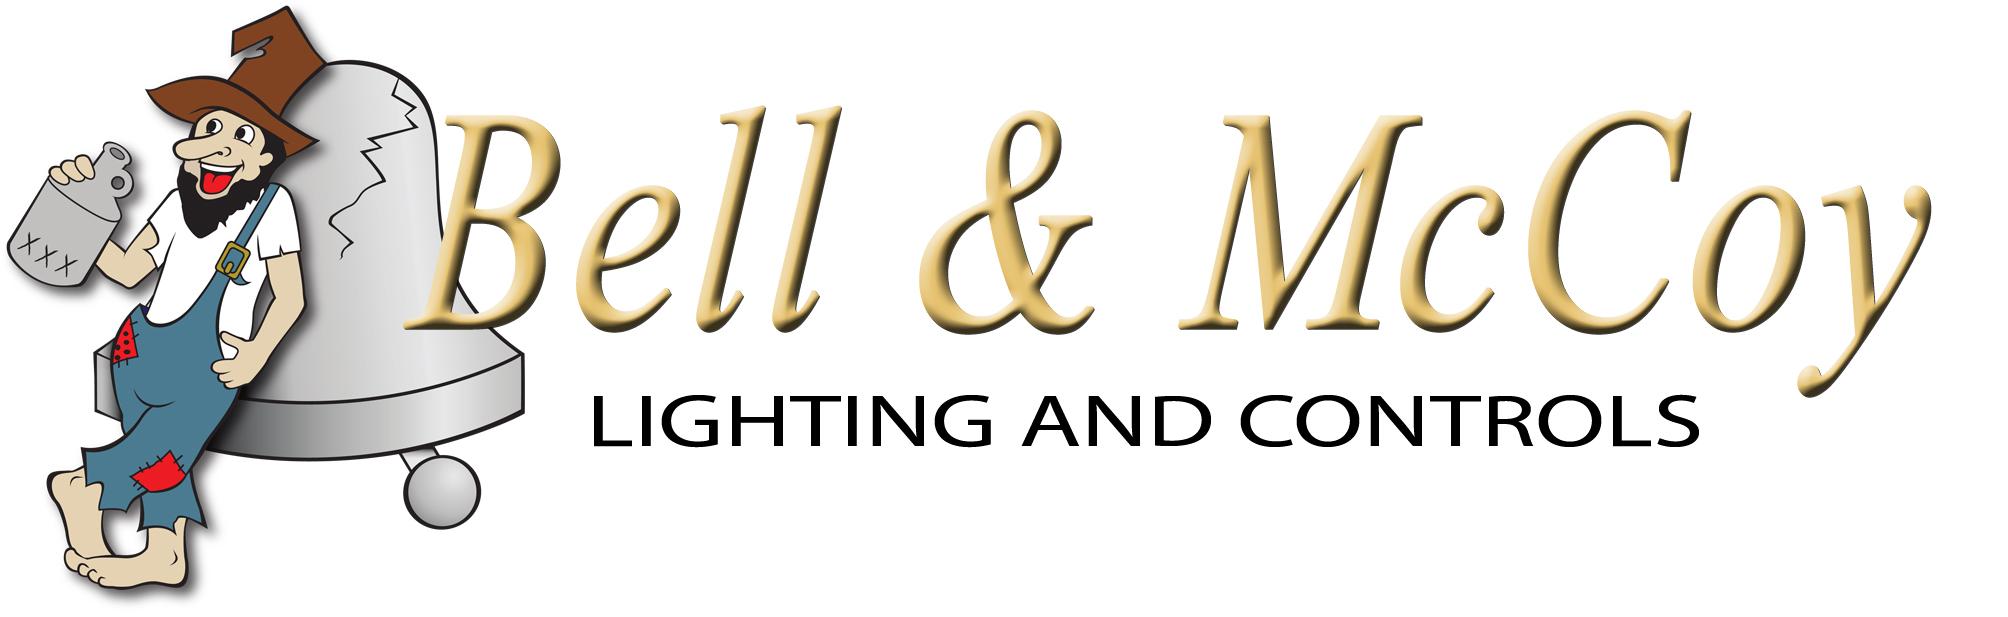 bmlc-logo.jpg